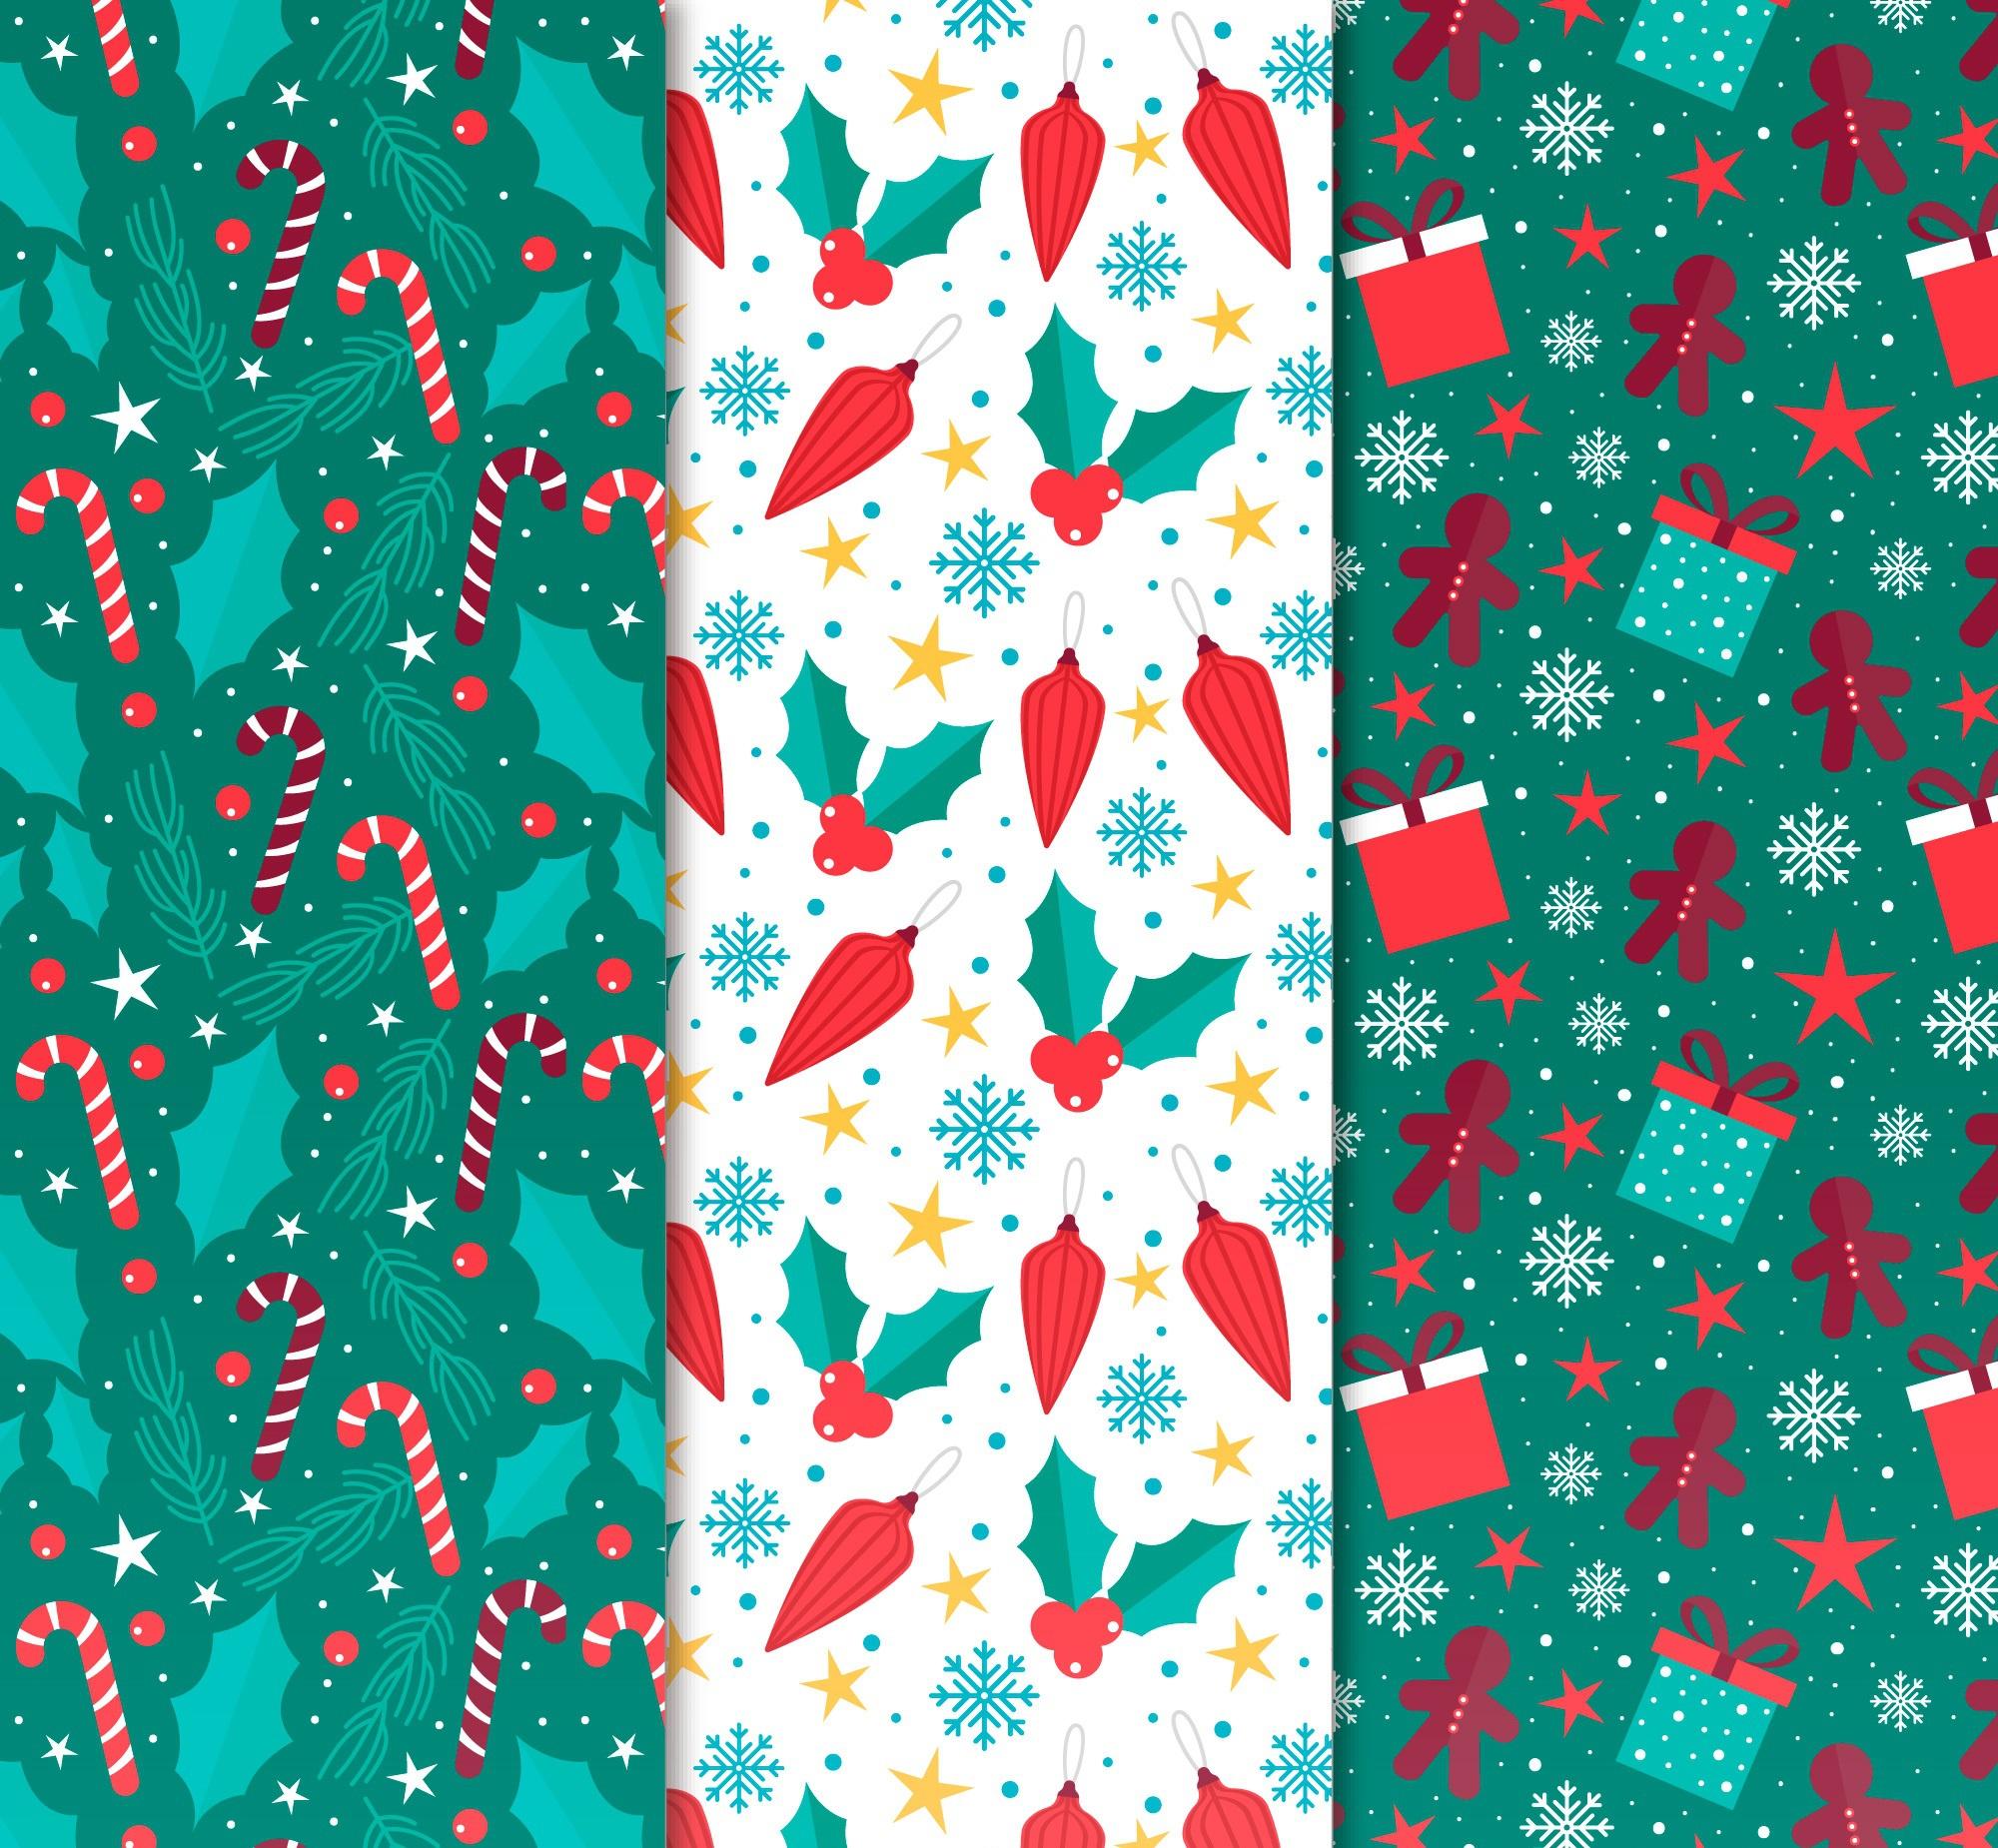 Christmas Texture.Wallpaper Christmas Texture Pattern 2000x1850